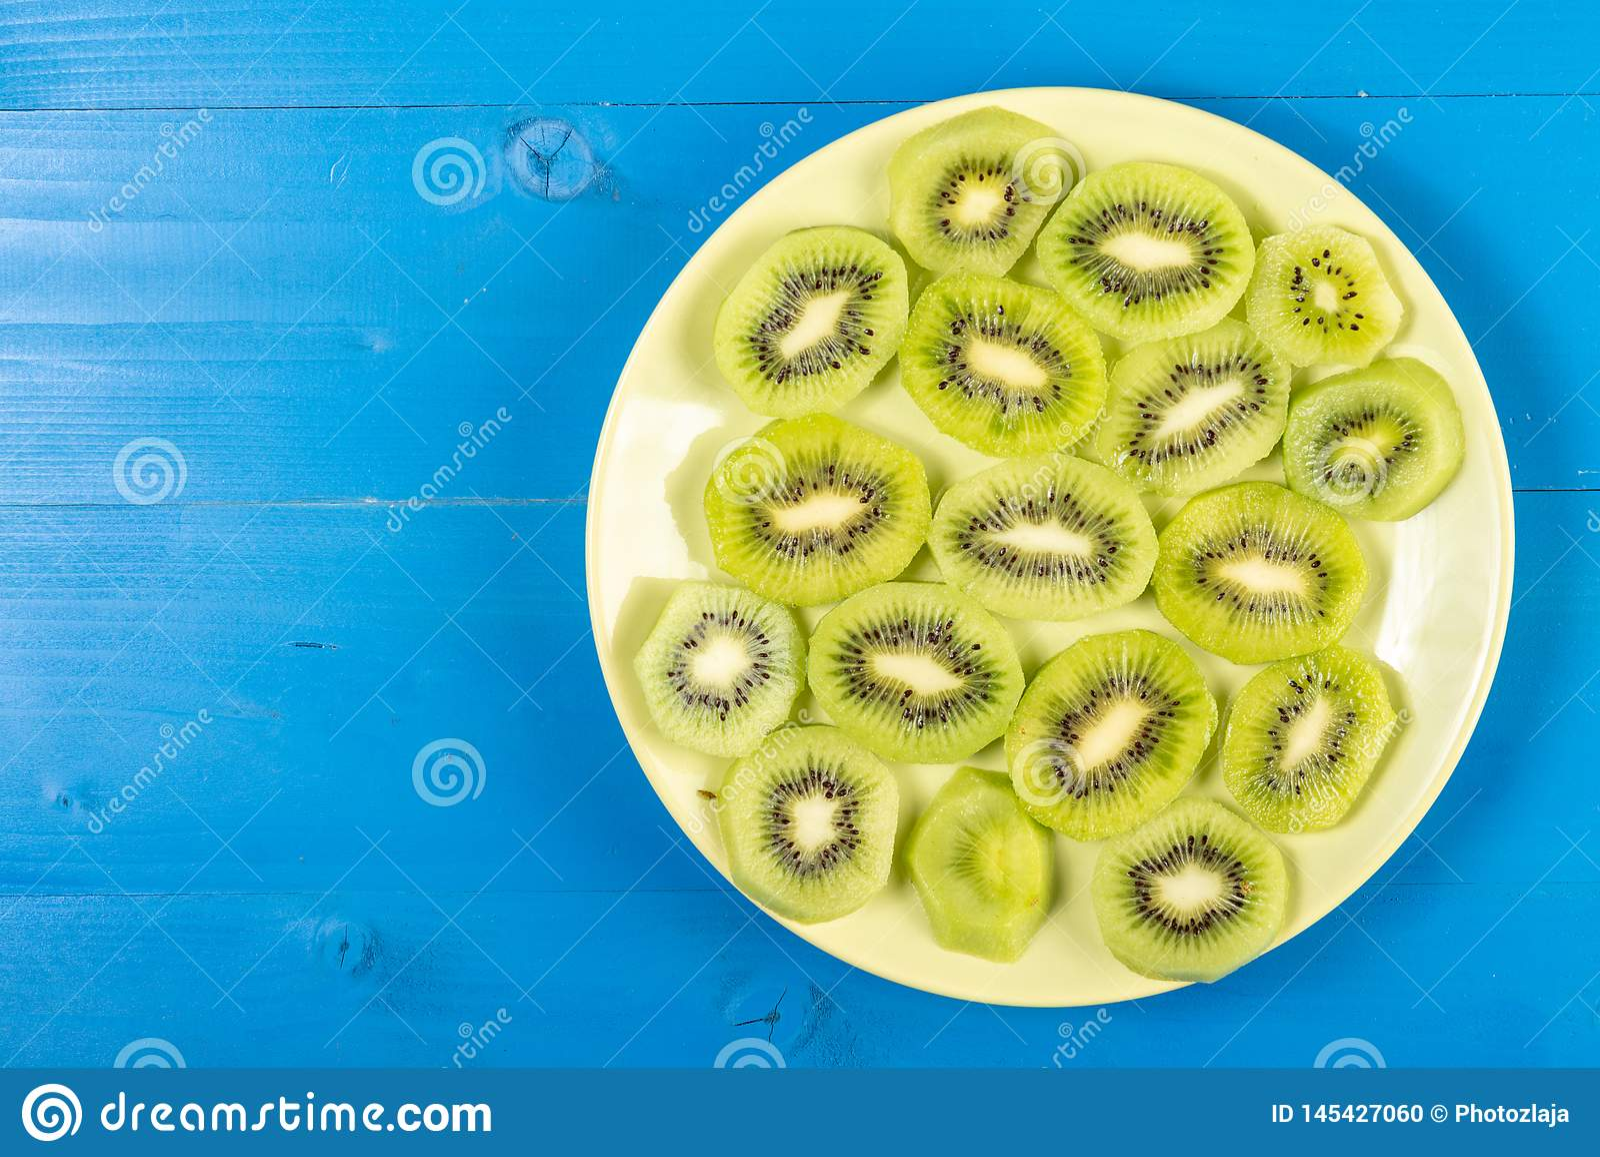 Skivade Kiwi Fruit On The Plate med bl? tabellbakgrund